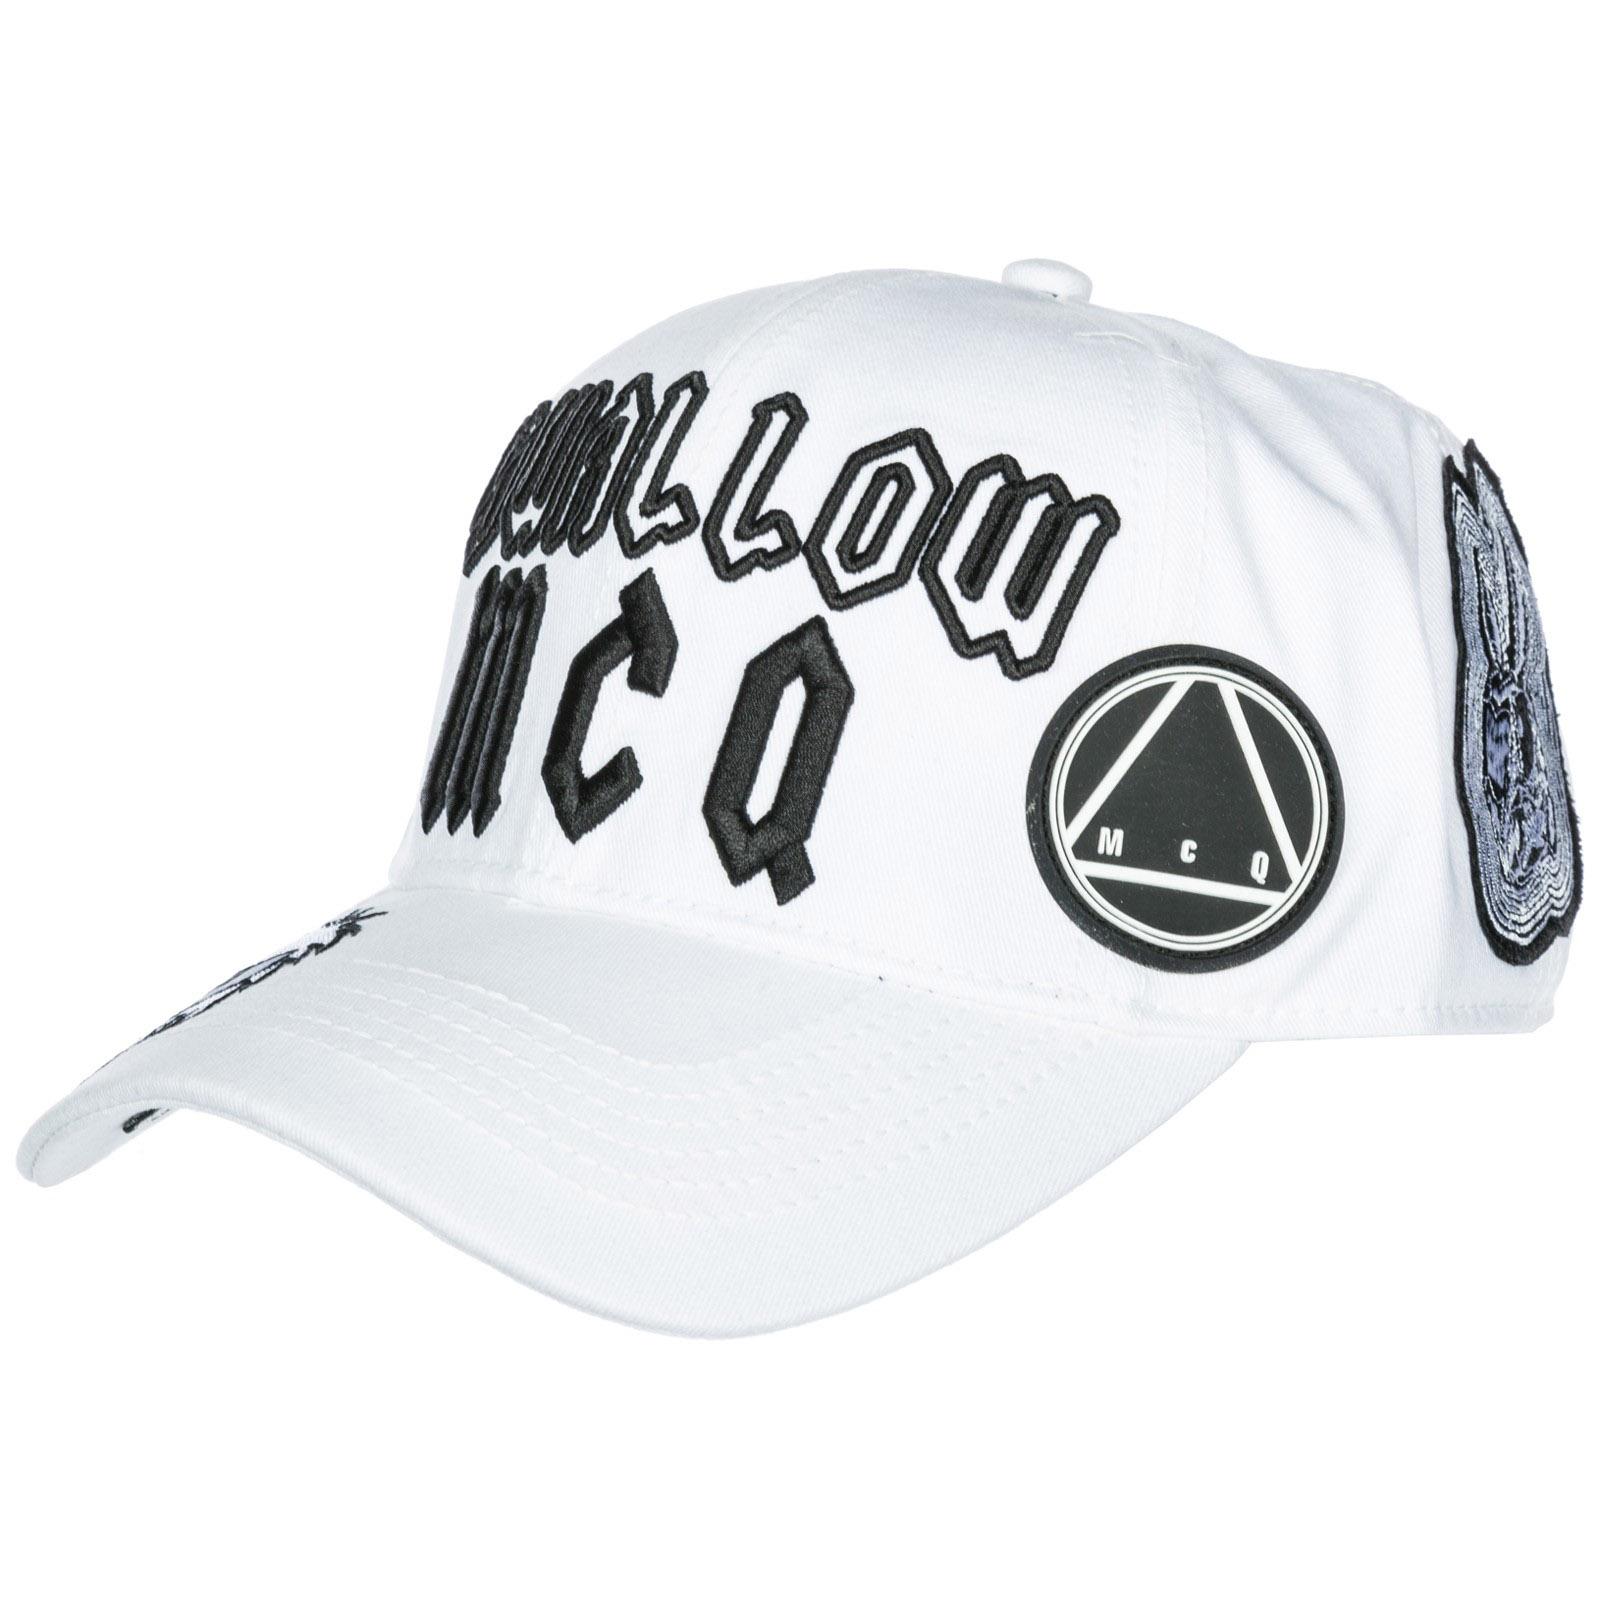 93d45d9115e Mcq By Alexander Mcqueen Adjustable Men S Cotton Hat Baseball Cap Swallow  In White